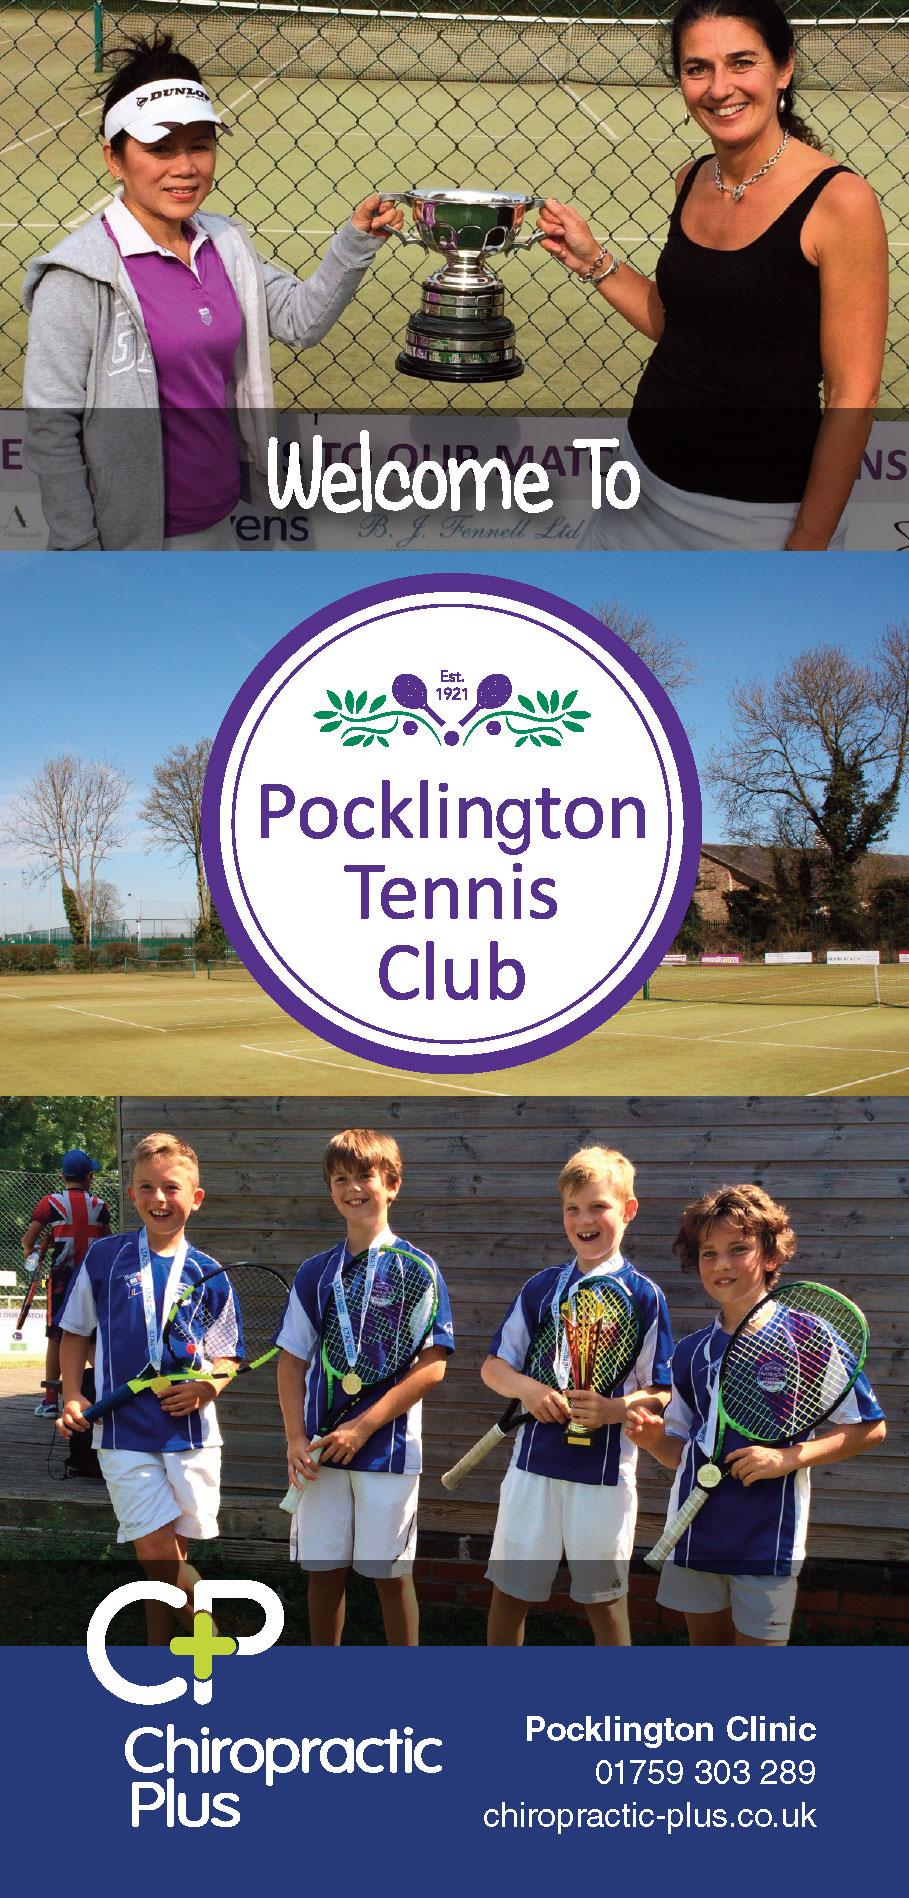 Pocklington Tennis Club leaflet